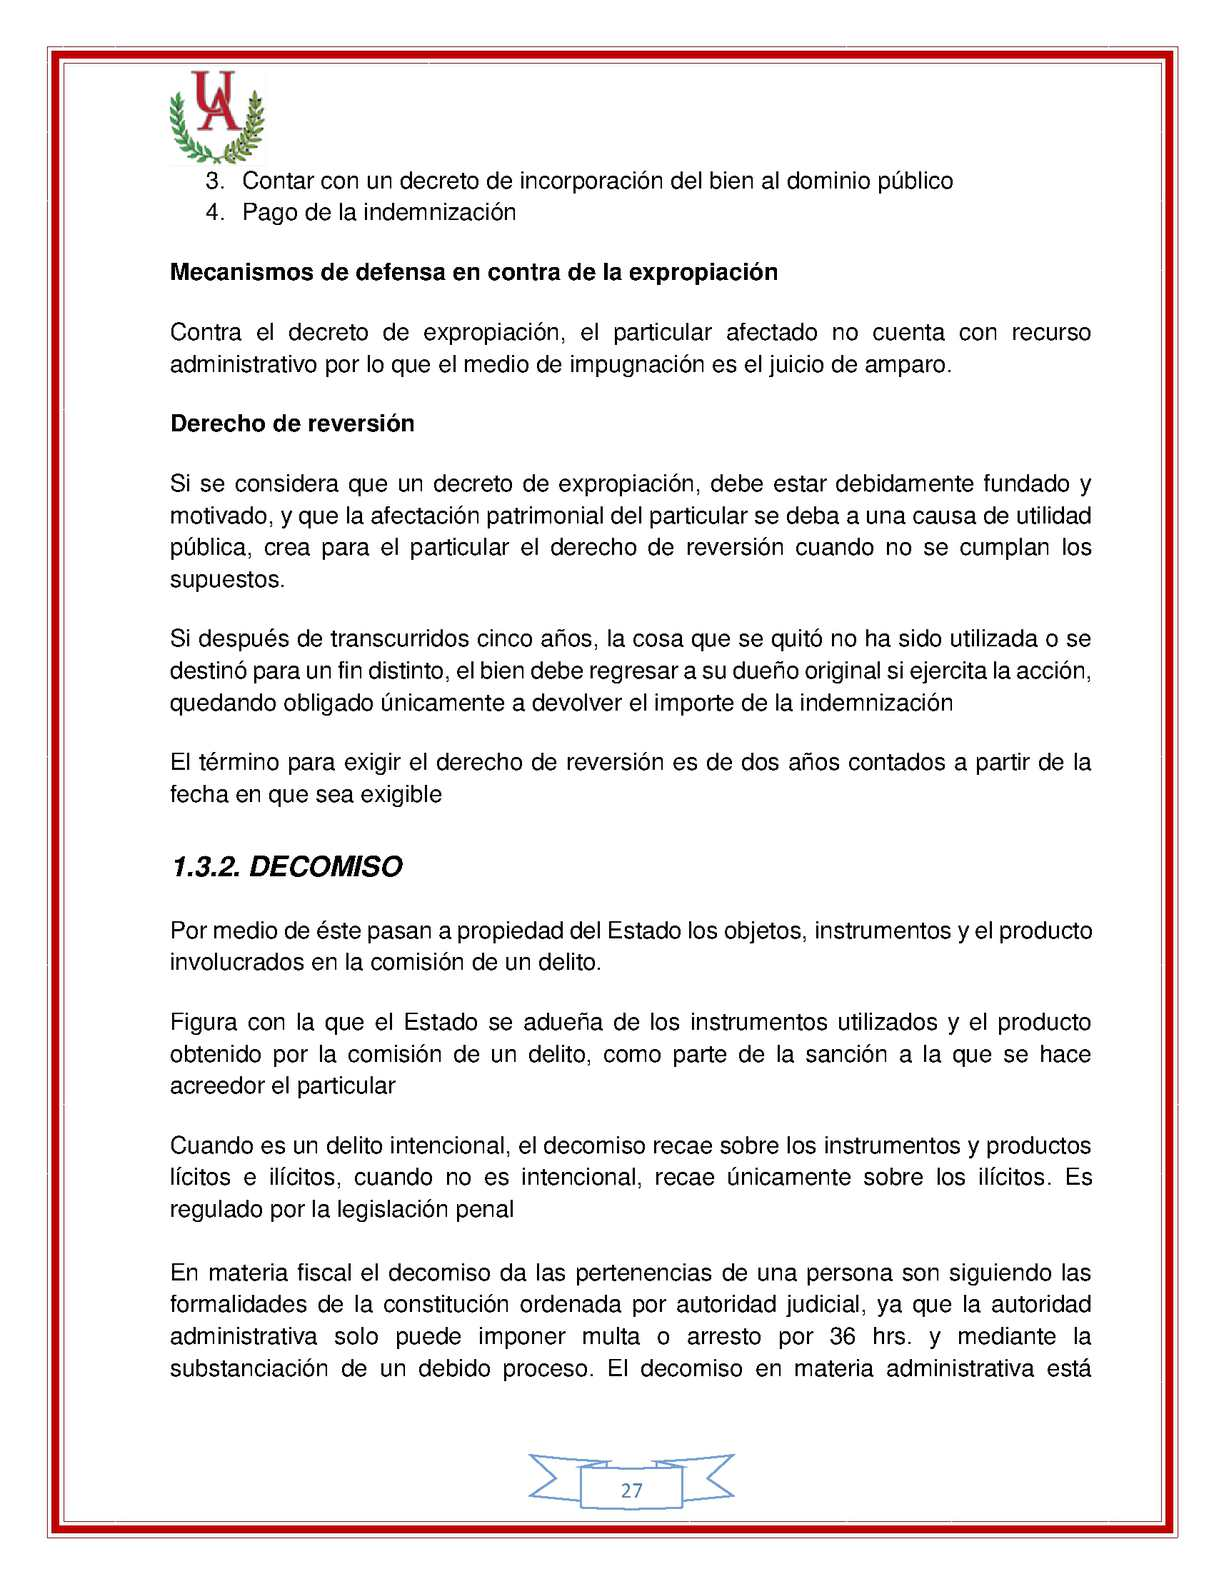 Antologia De Derecho Admon 5°cmld - CALAMEO Downloader